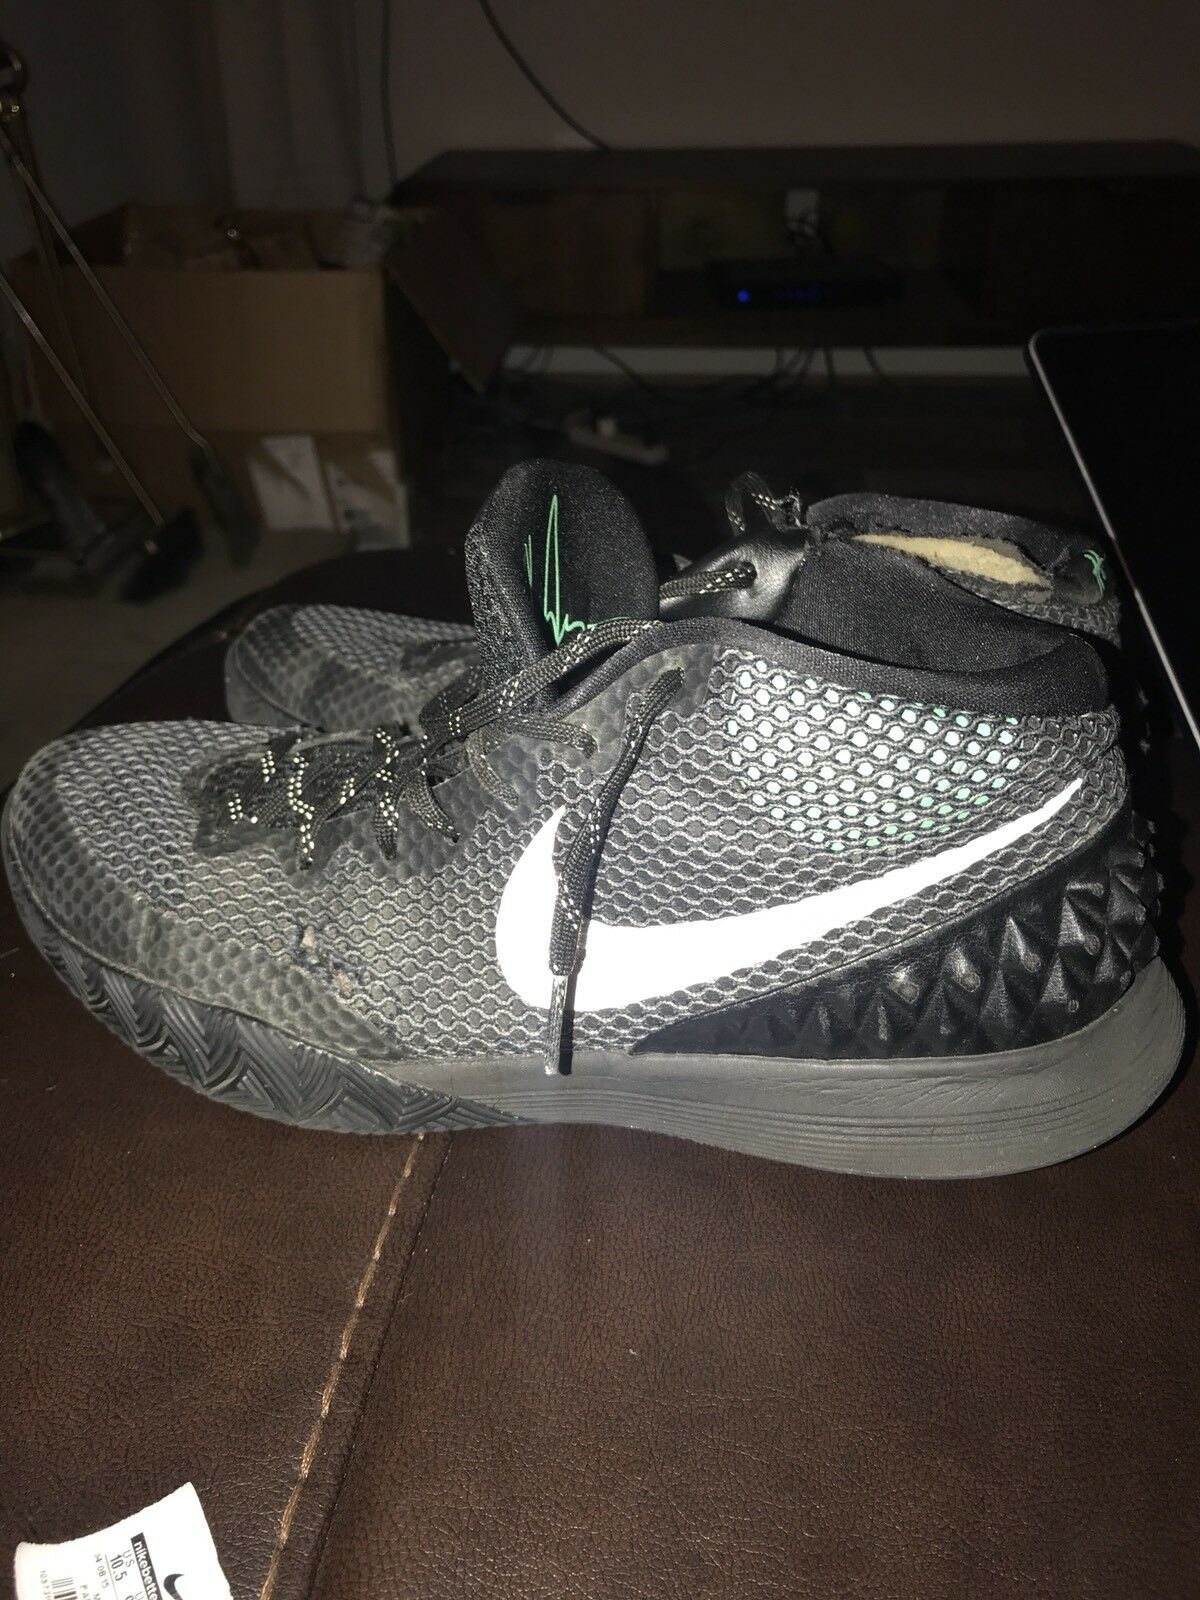 Nike Kyrie 1 Driveway Green Glow Gl705277-001 Basketball Shoes US 10.5